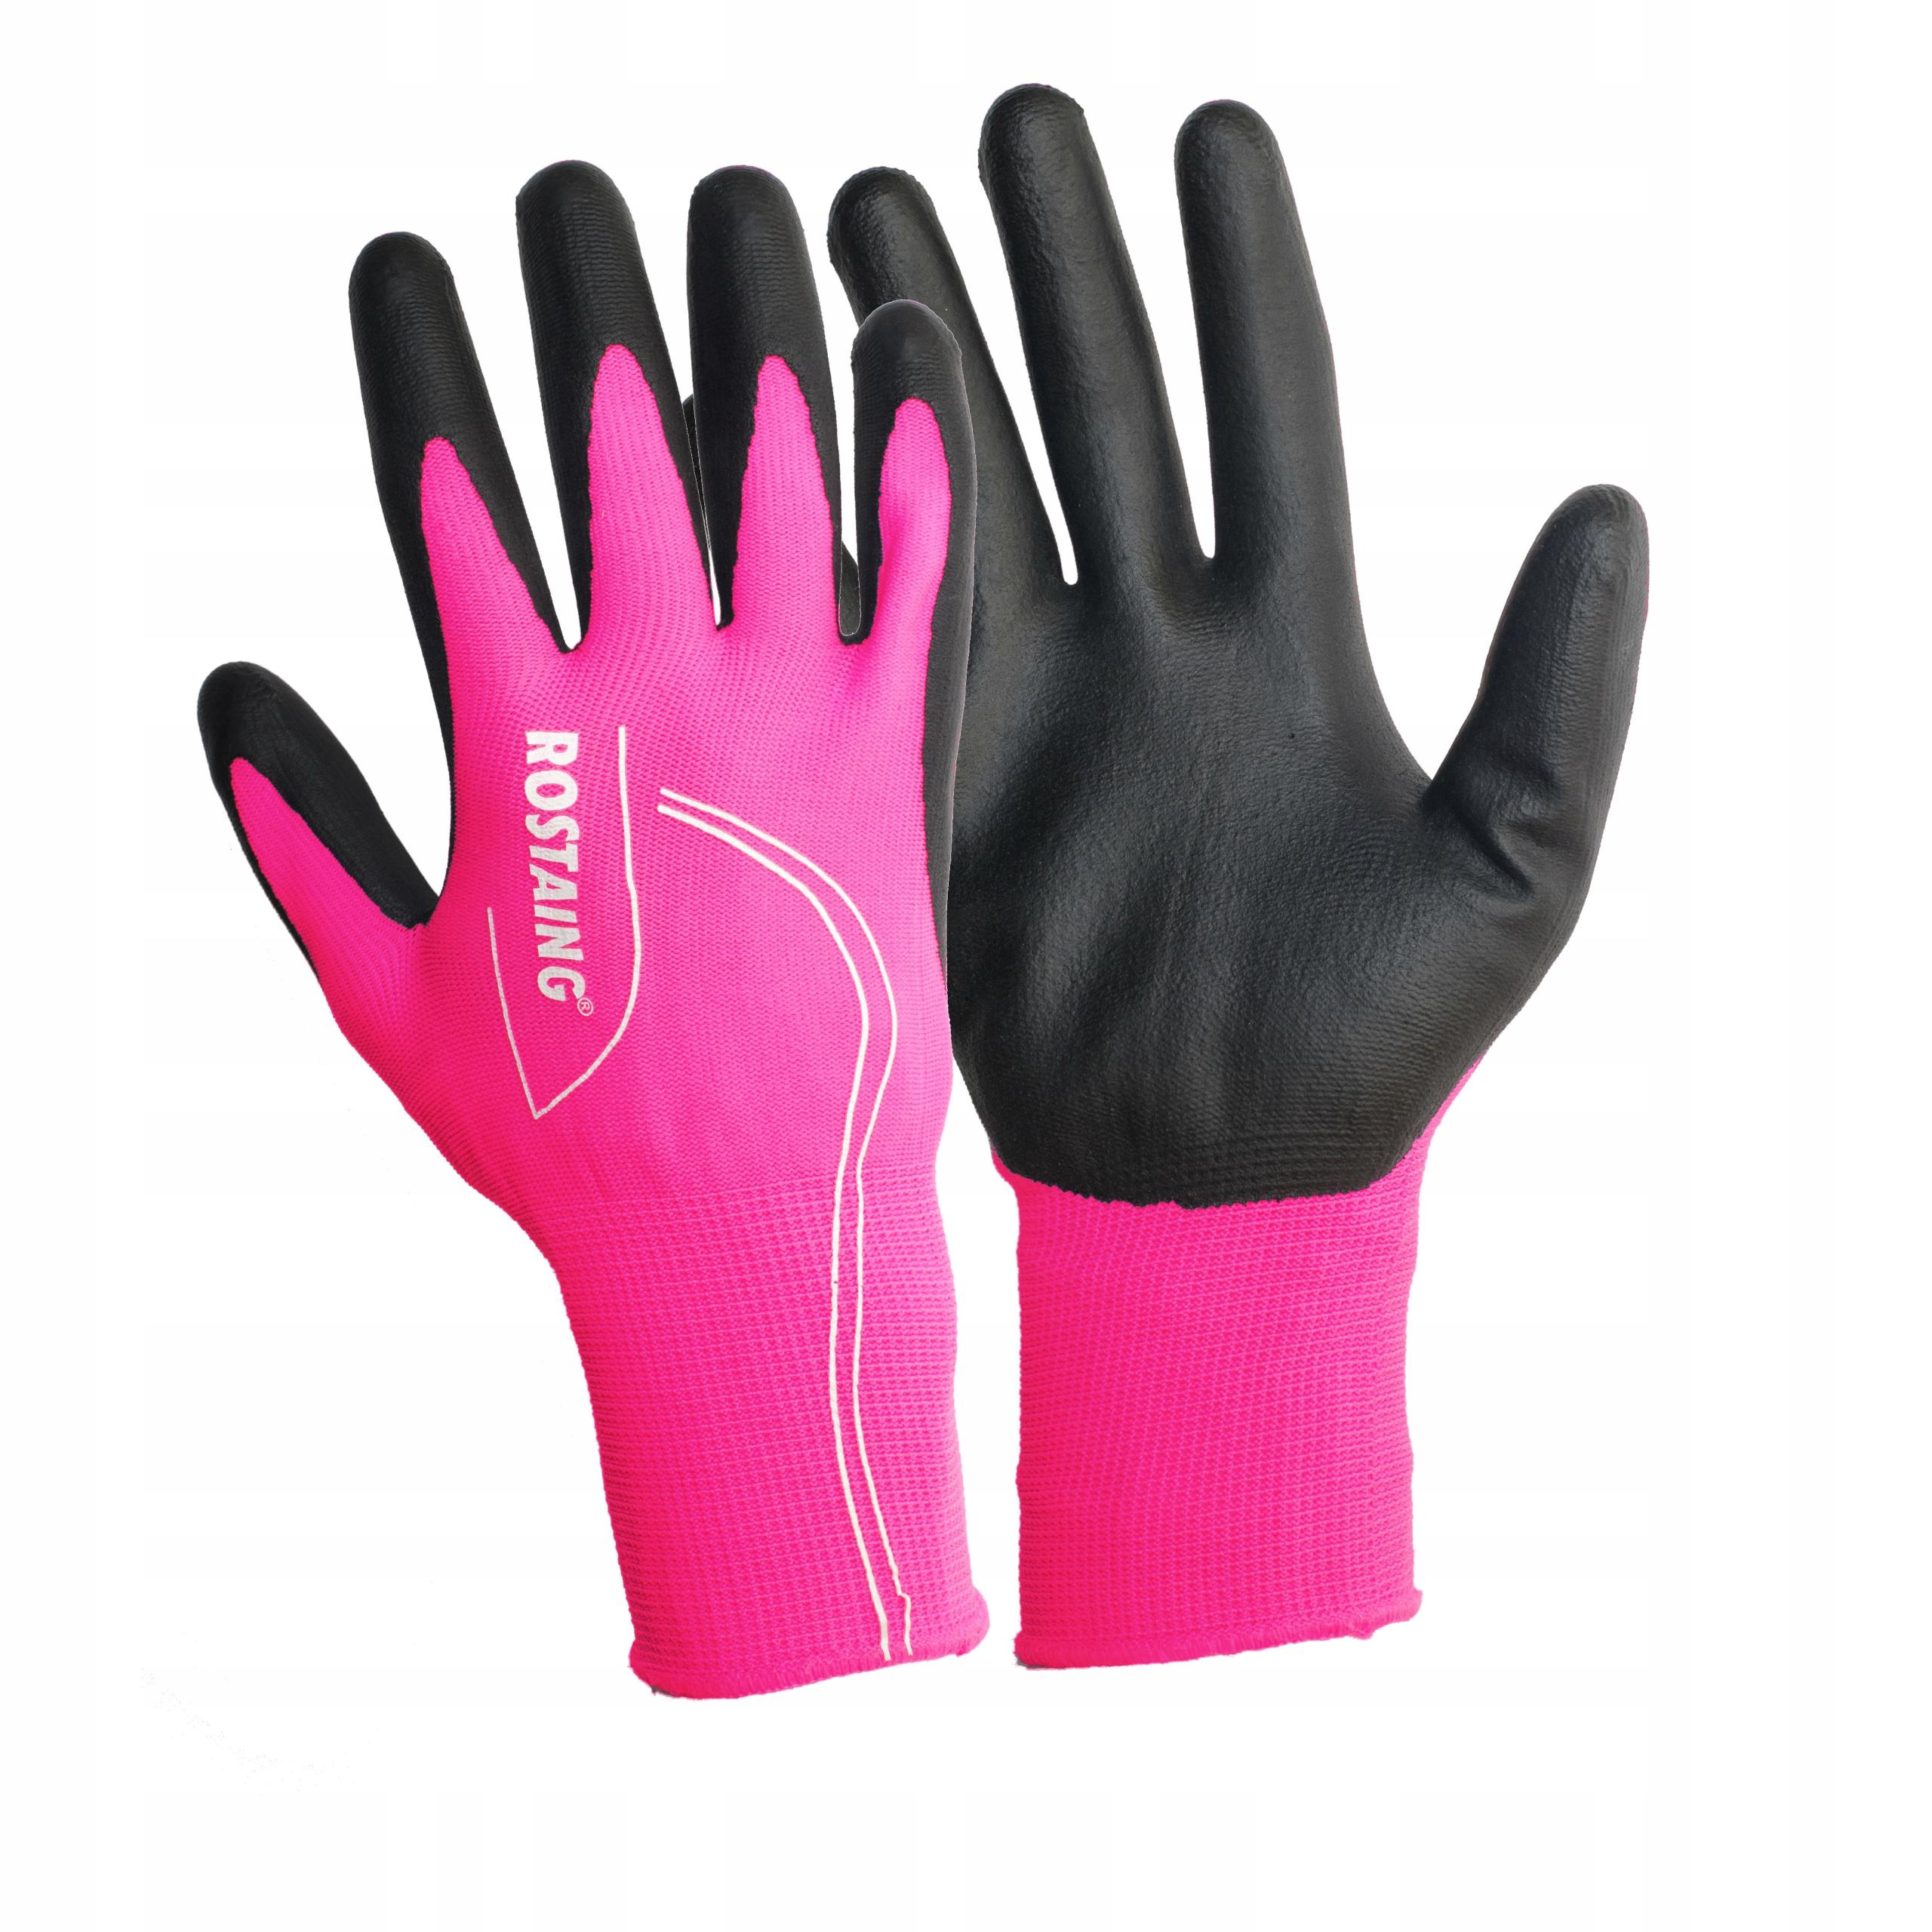 MAXFEEL GLOVES ЖЕНСКИЕ перчатки размер 7-8